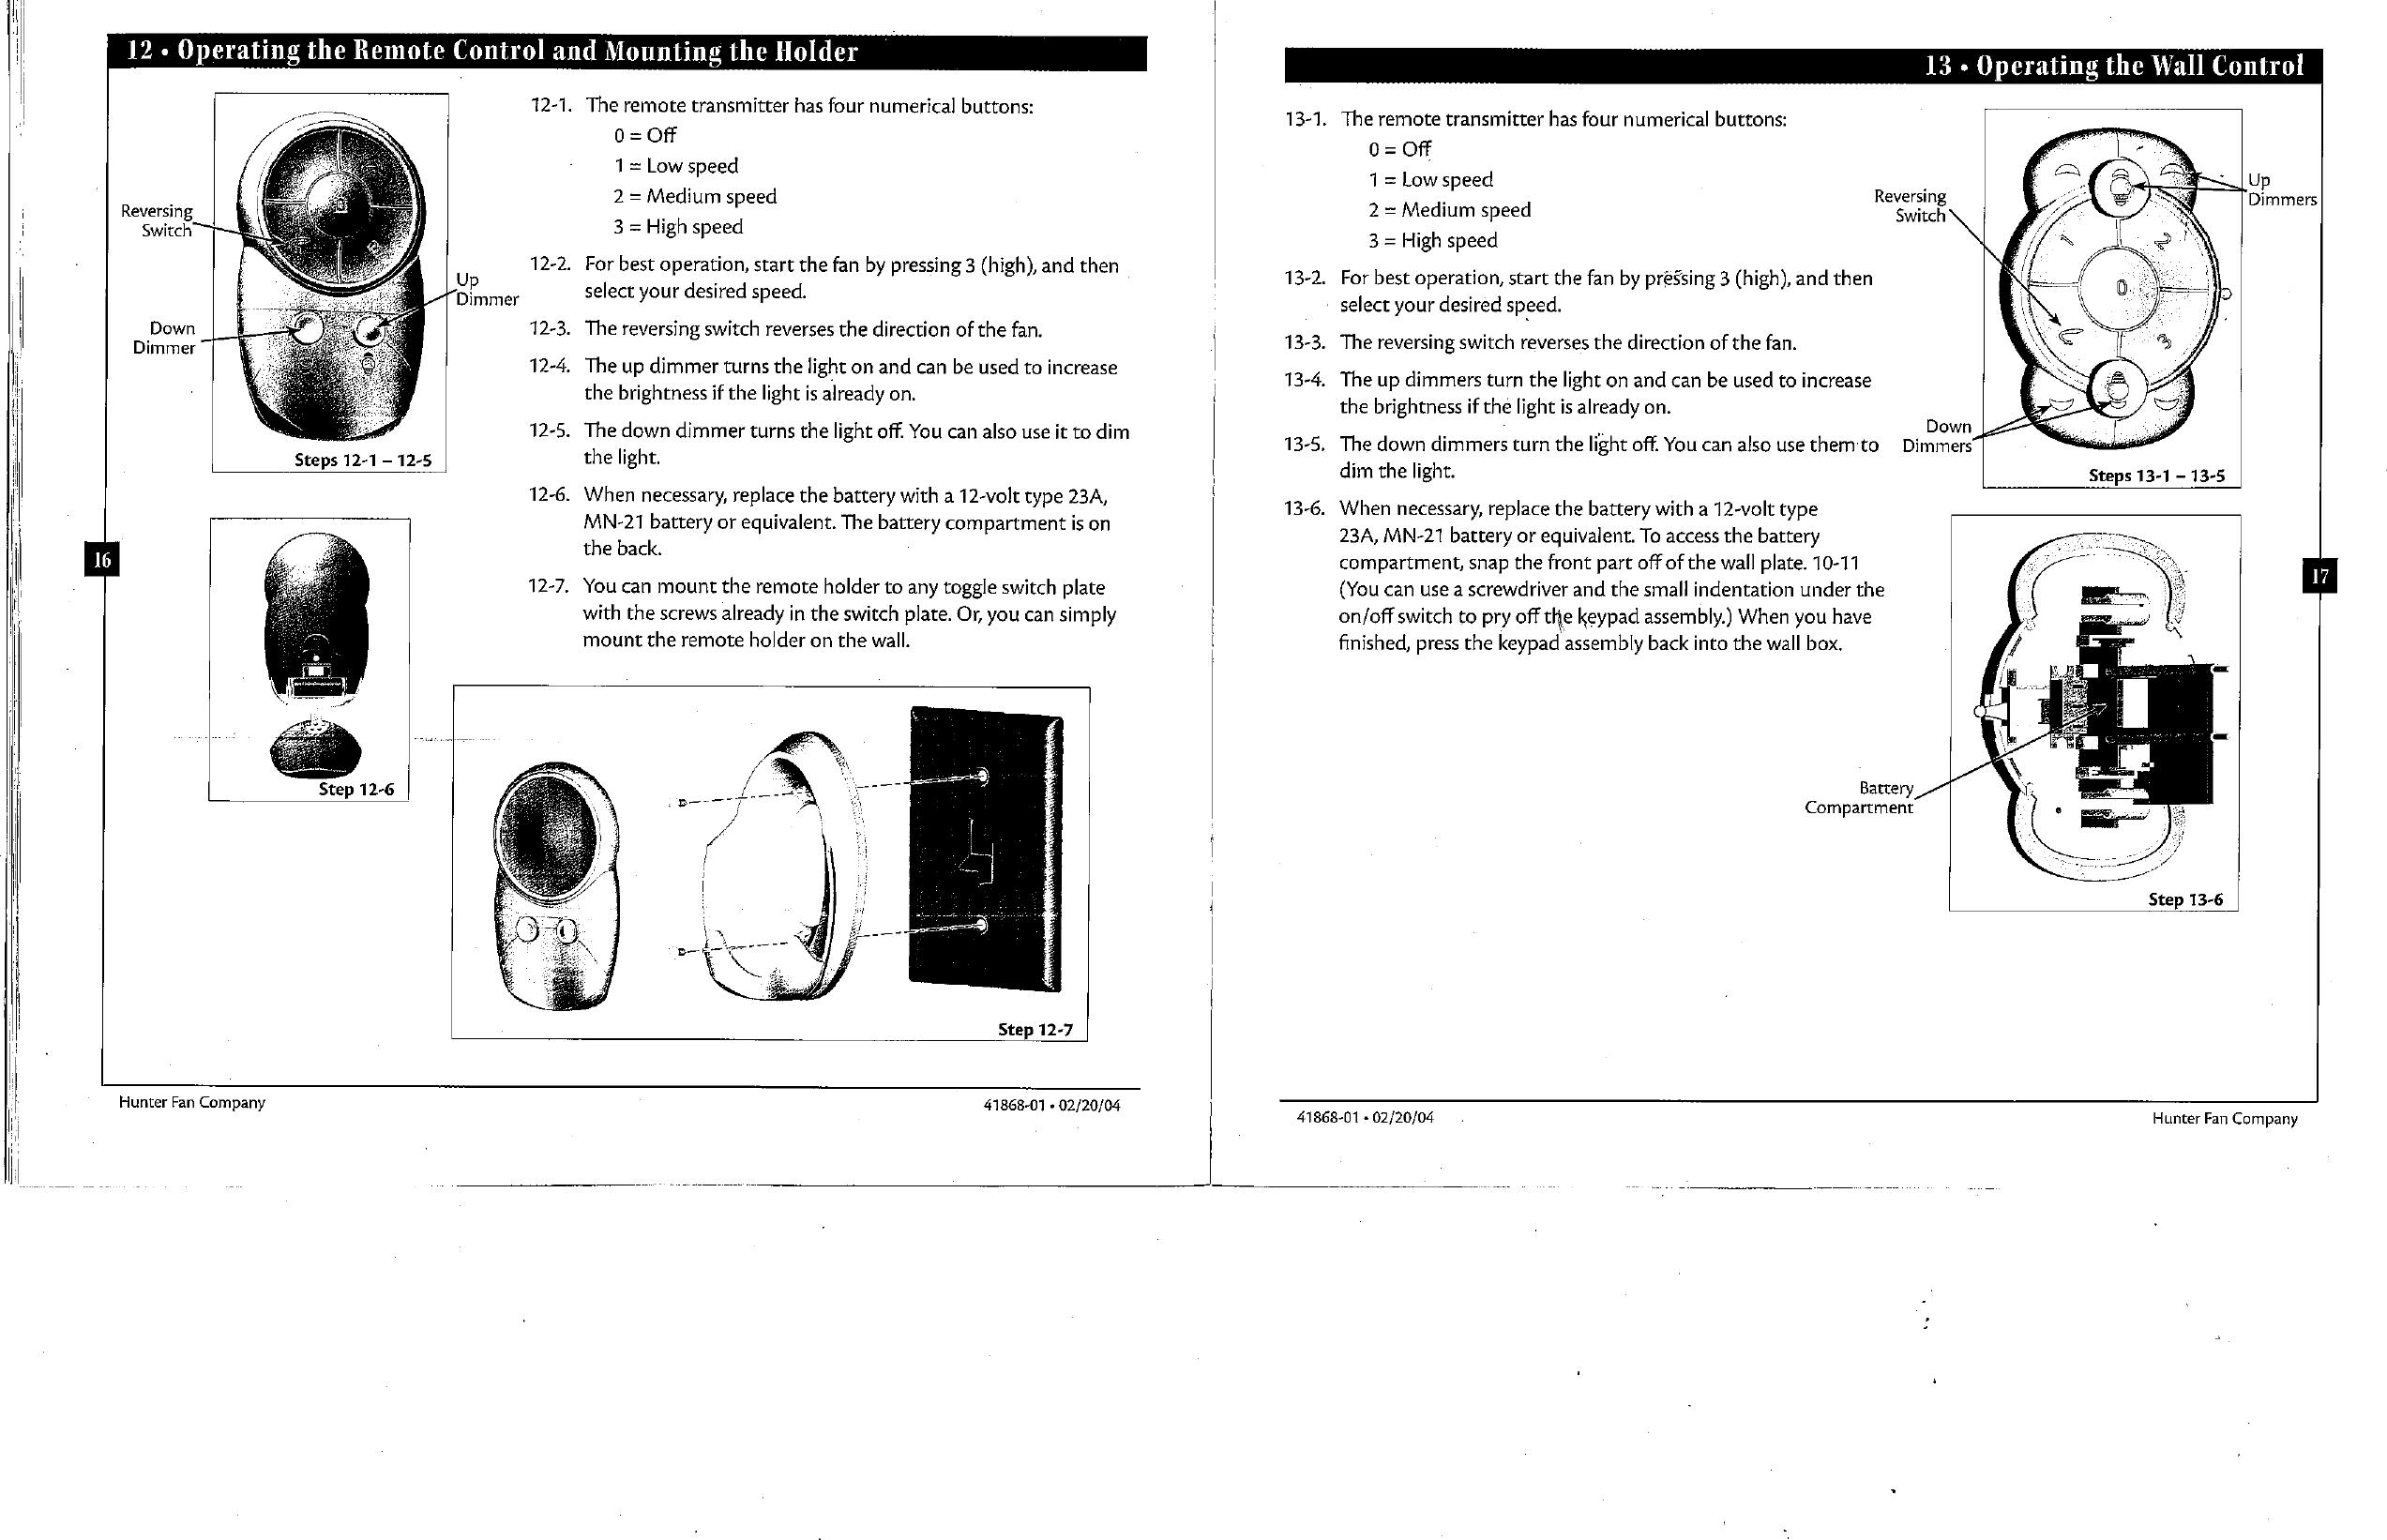 designer choice ceiling fan remote manual